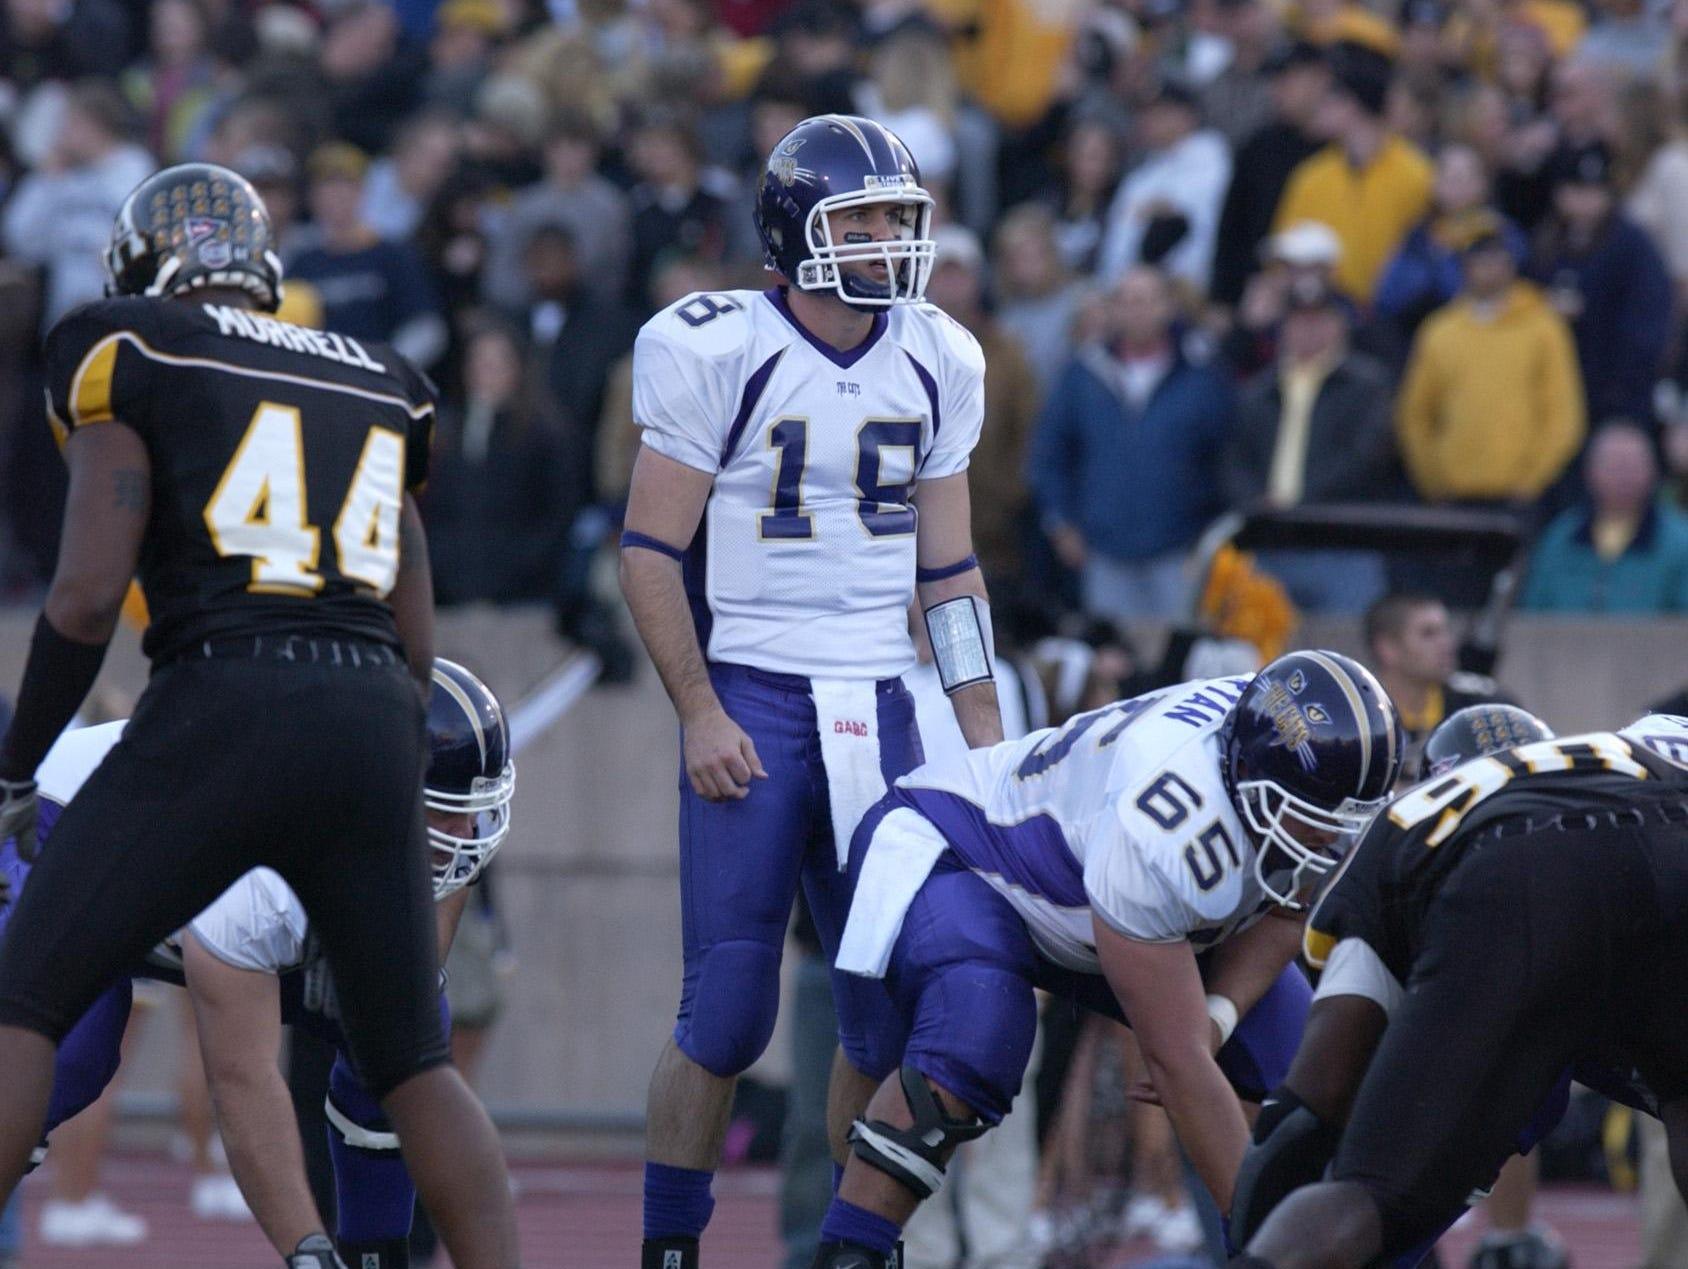 Former Western Carolina University quarterback Justin Clark is the new football coach at North Henderson.